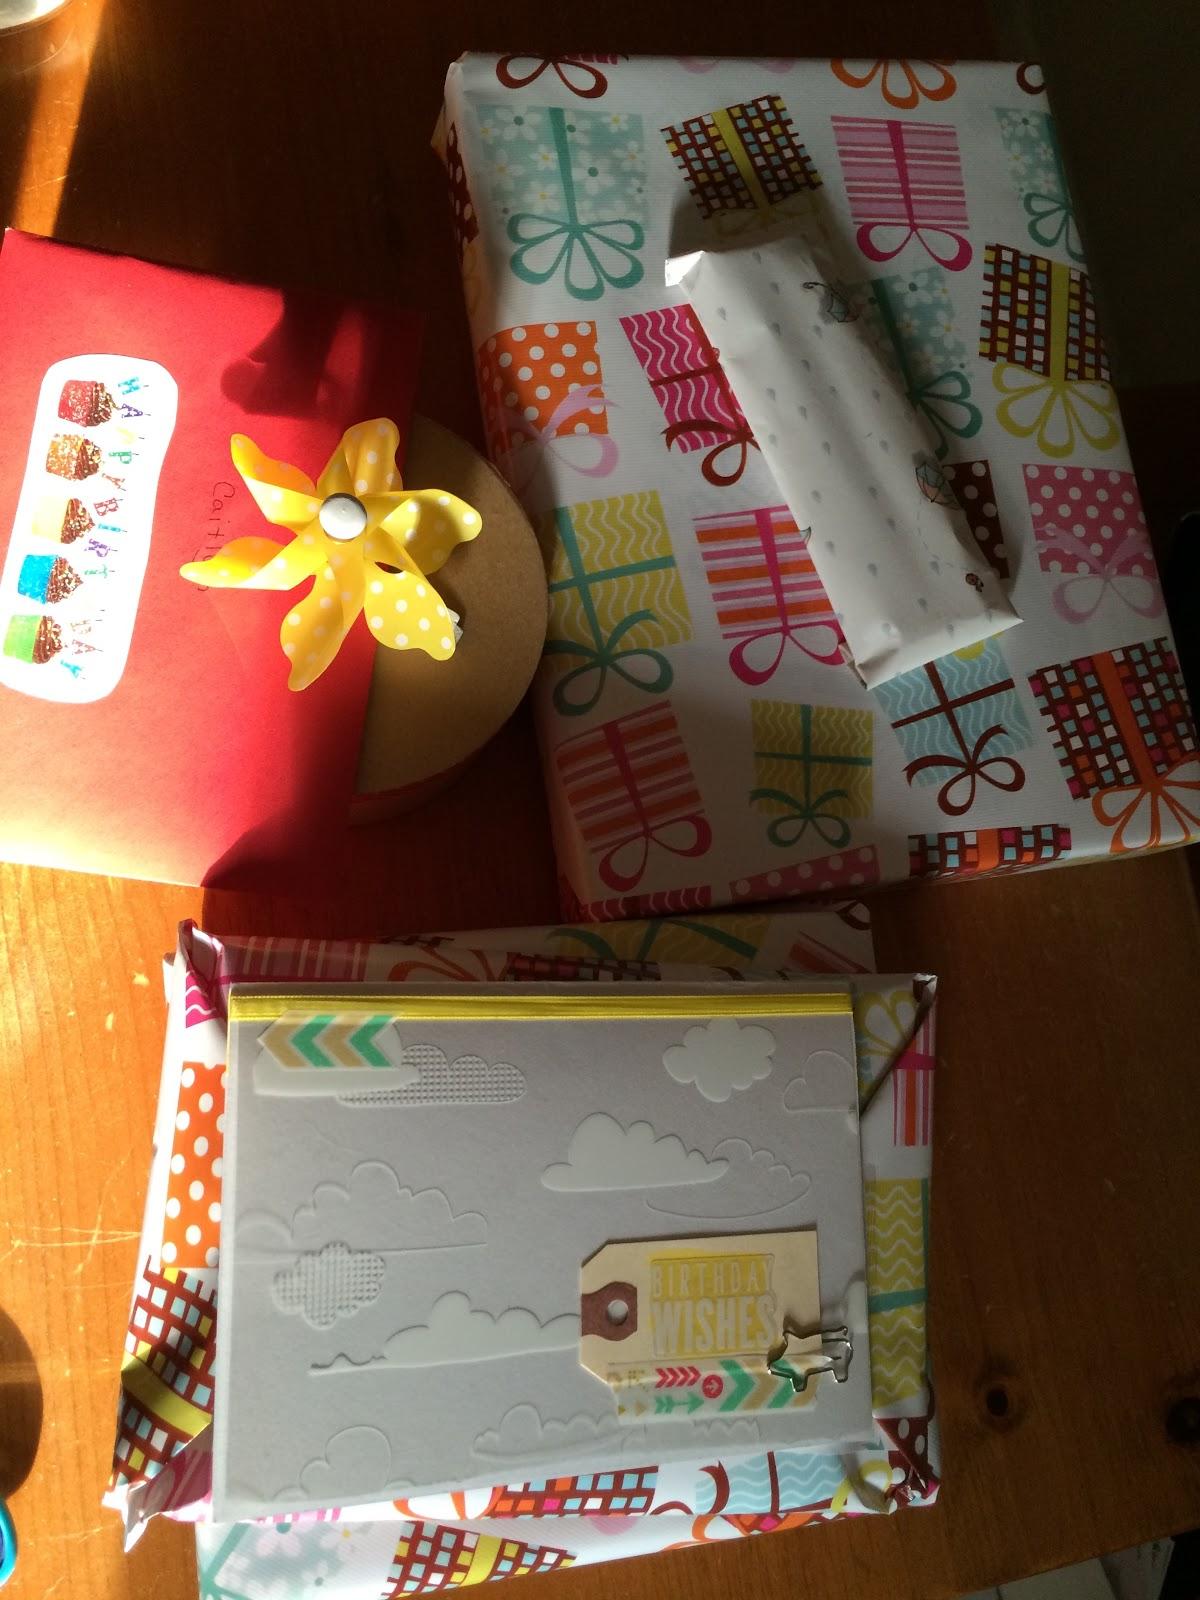 13th birthday presents